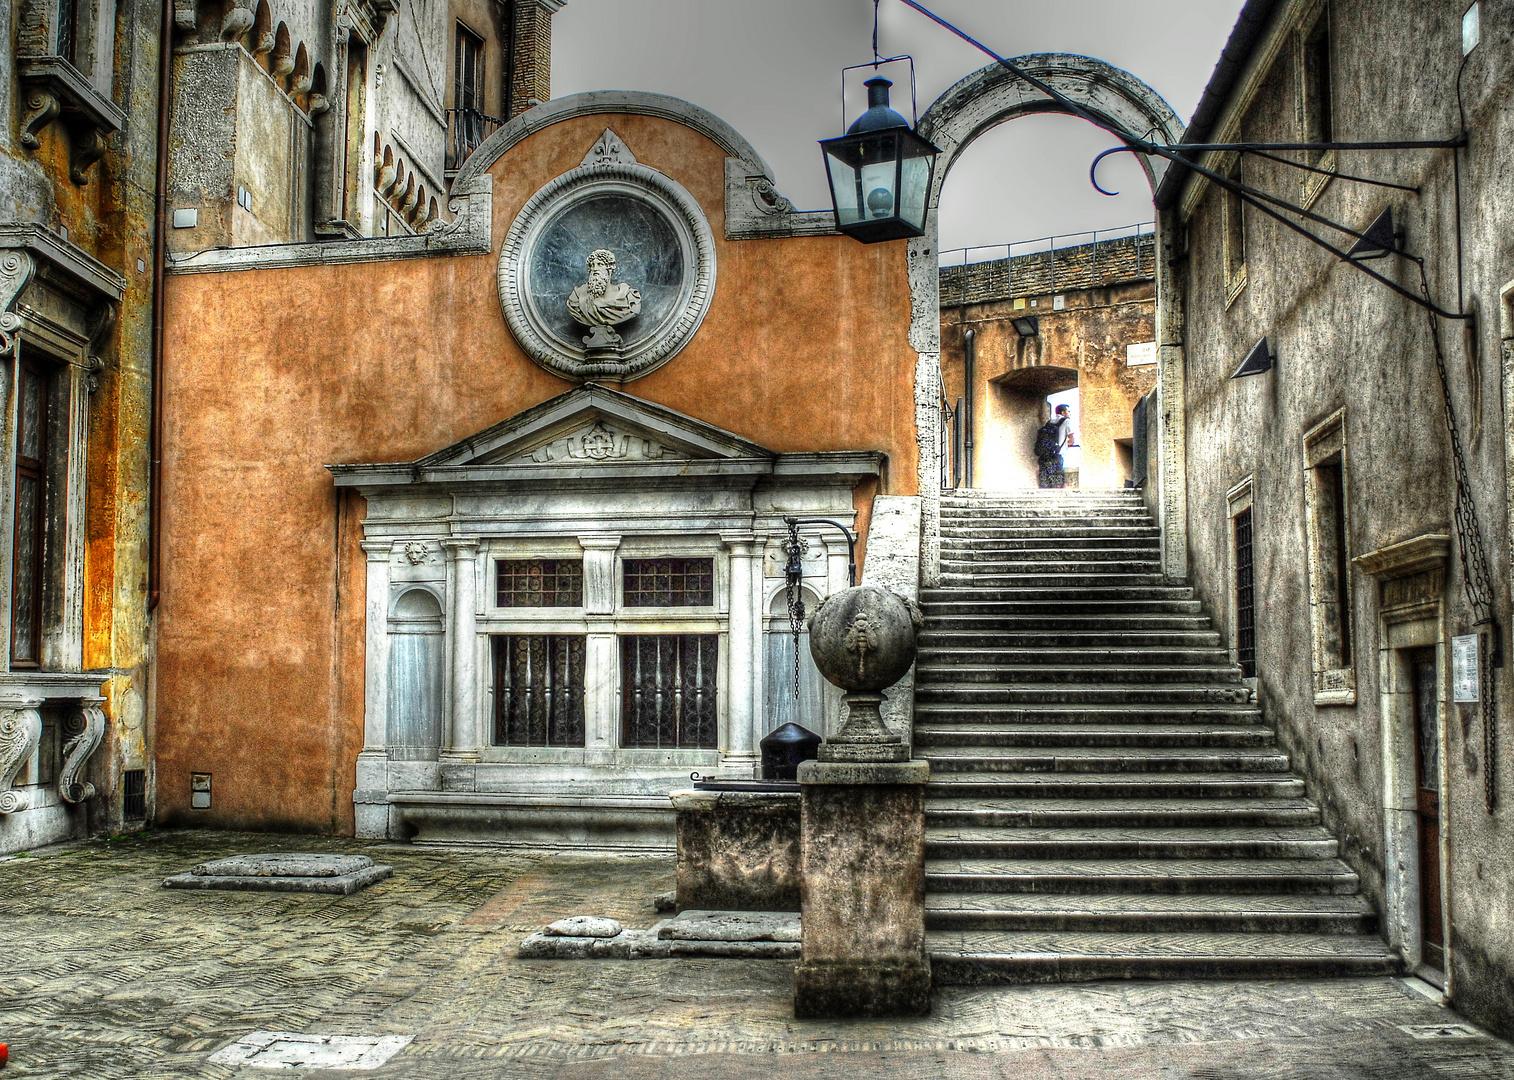 Rom, Engelsburg, Castel sant' Angelo, Mausoleum di Adriano (Zugang zum Appartamento del Castellano